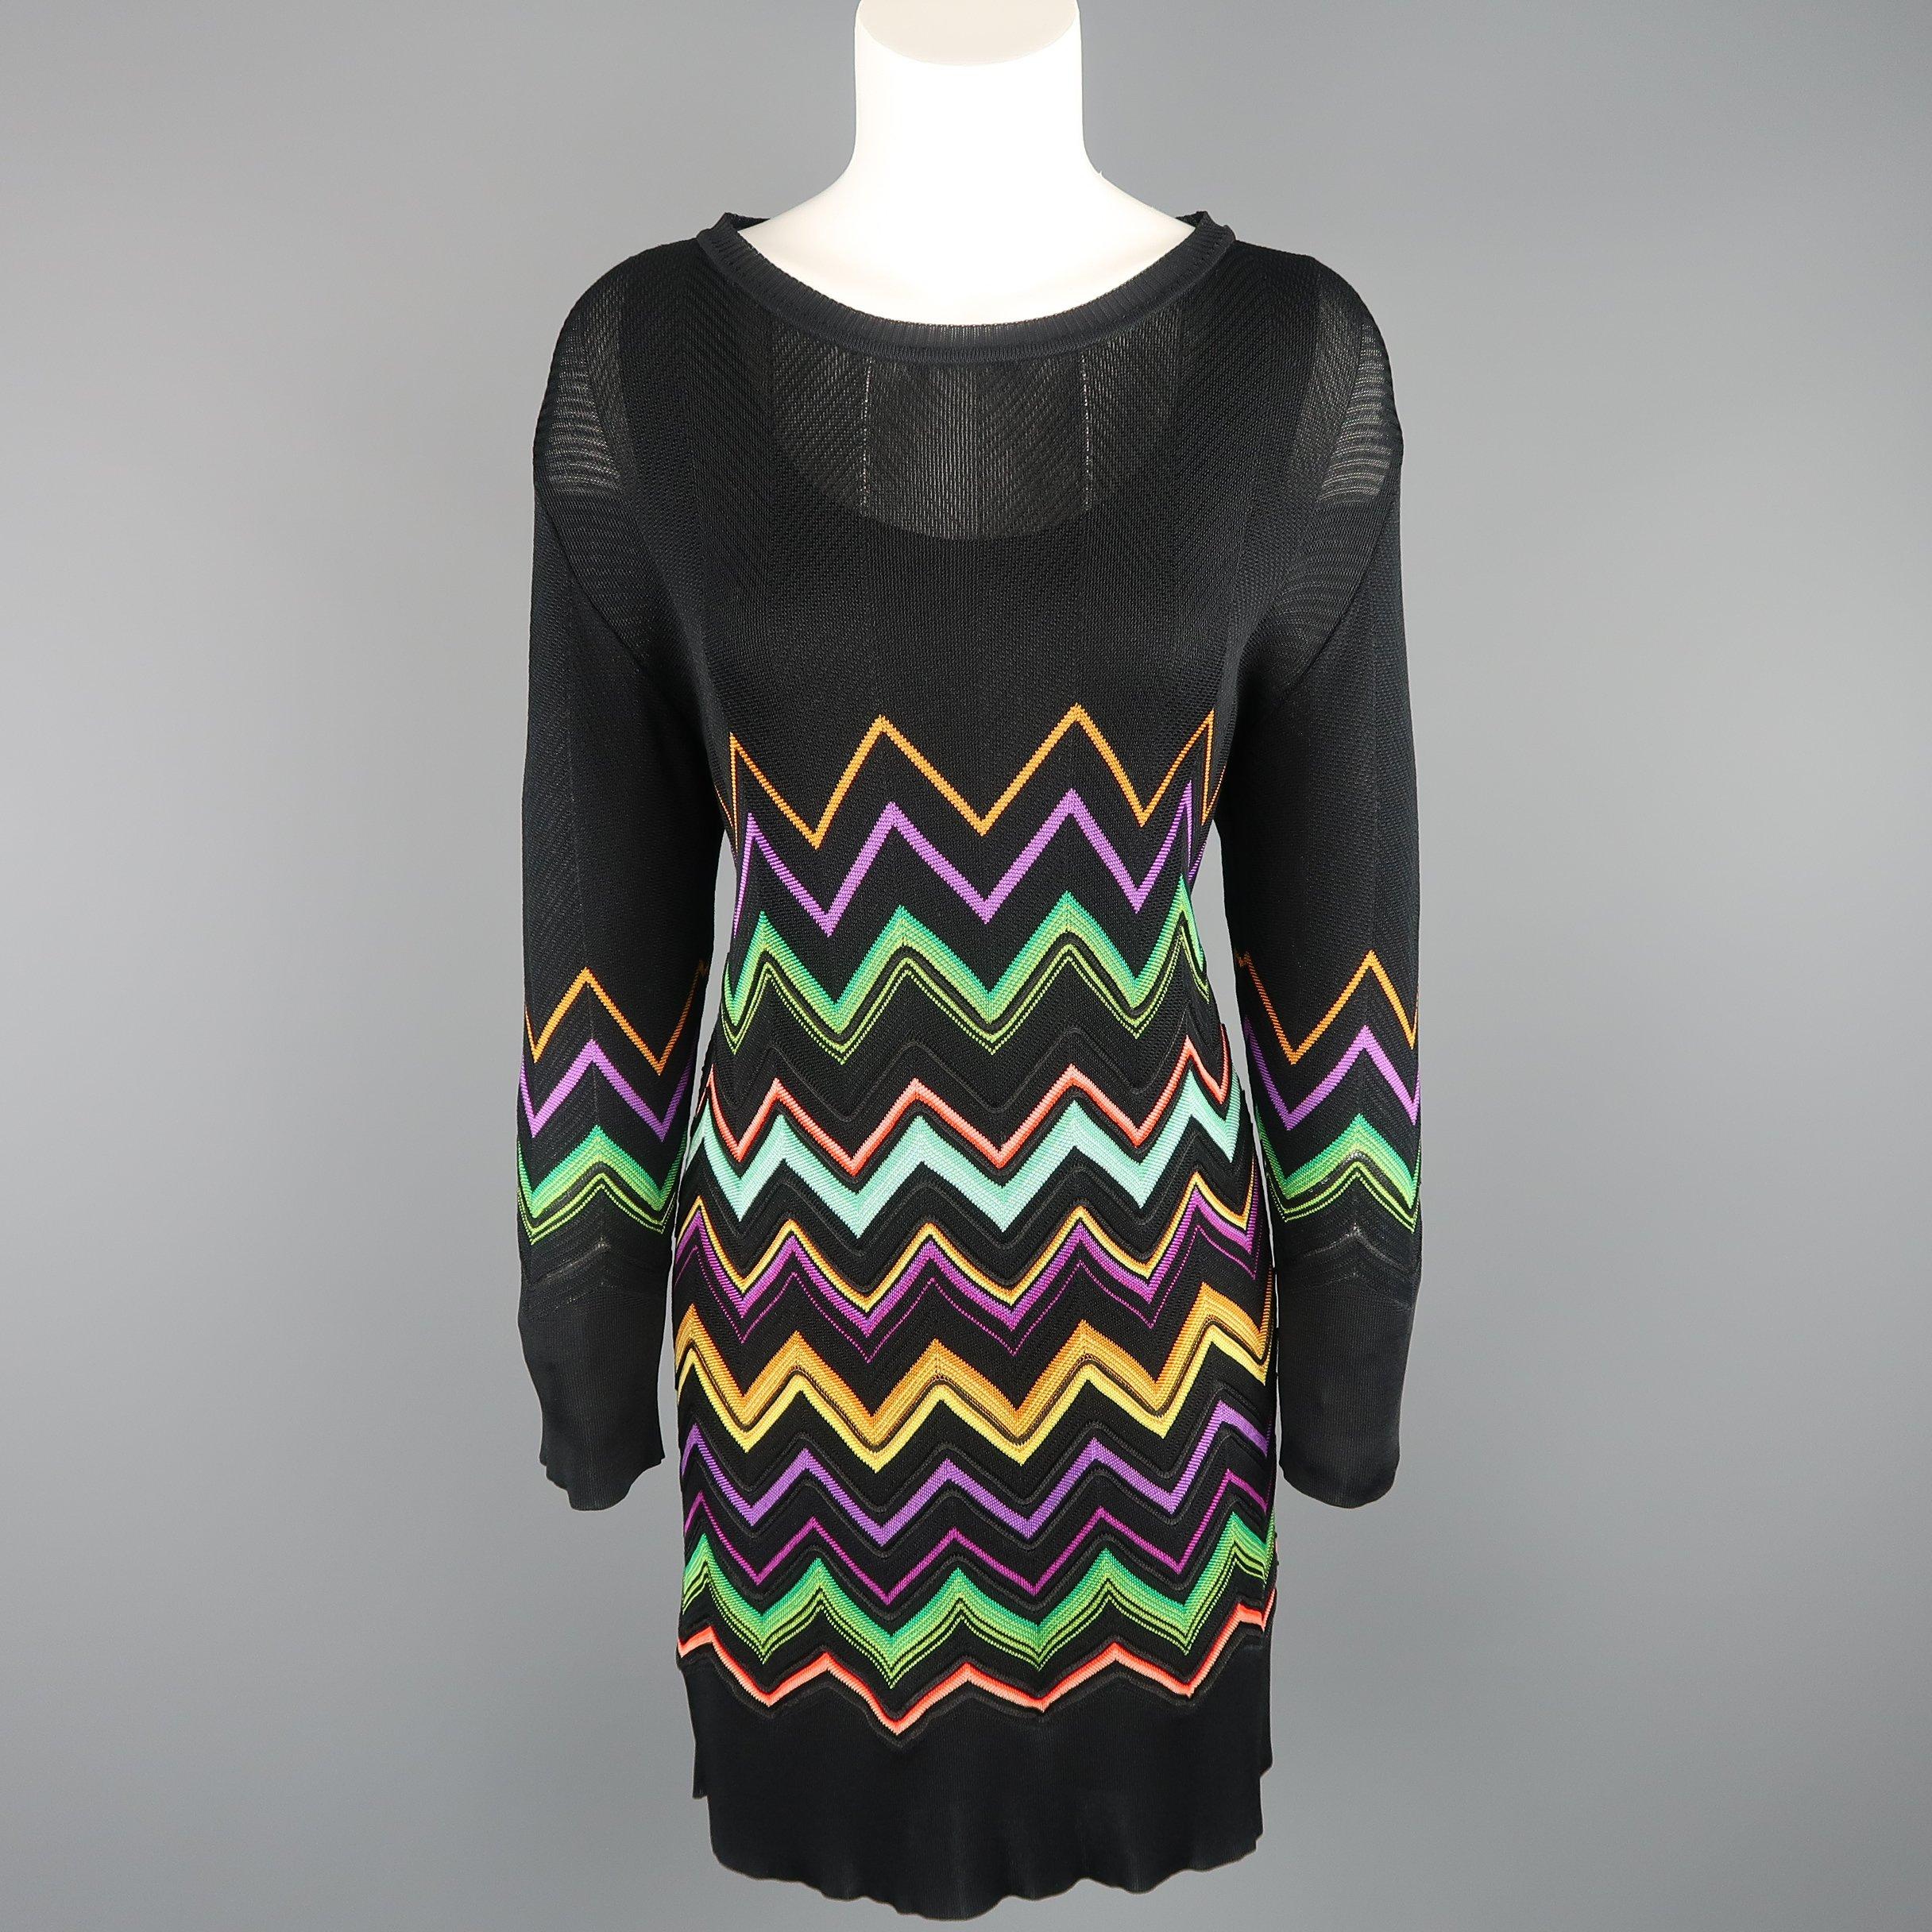 1940s Chevron Stripe Grey /& Black Satin dress